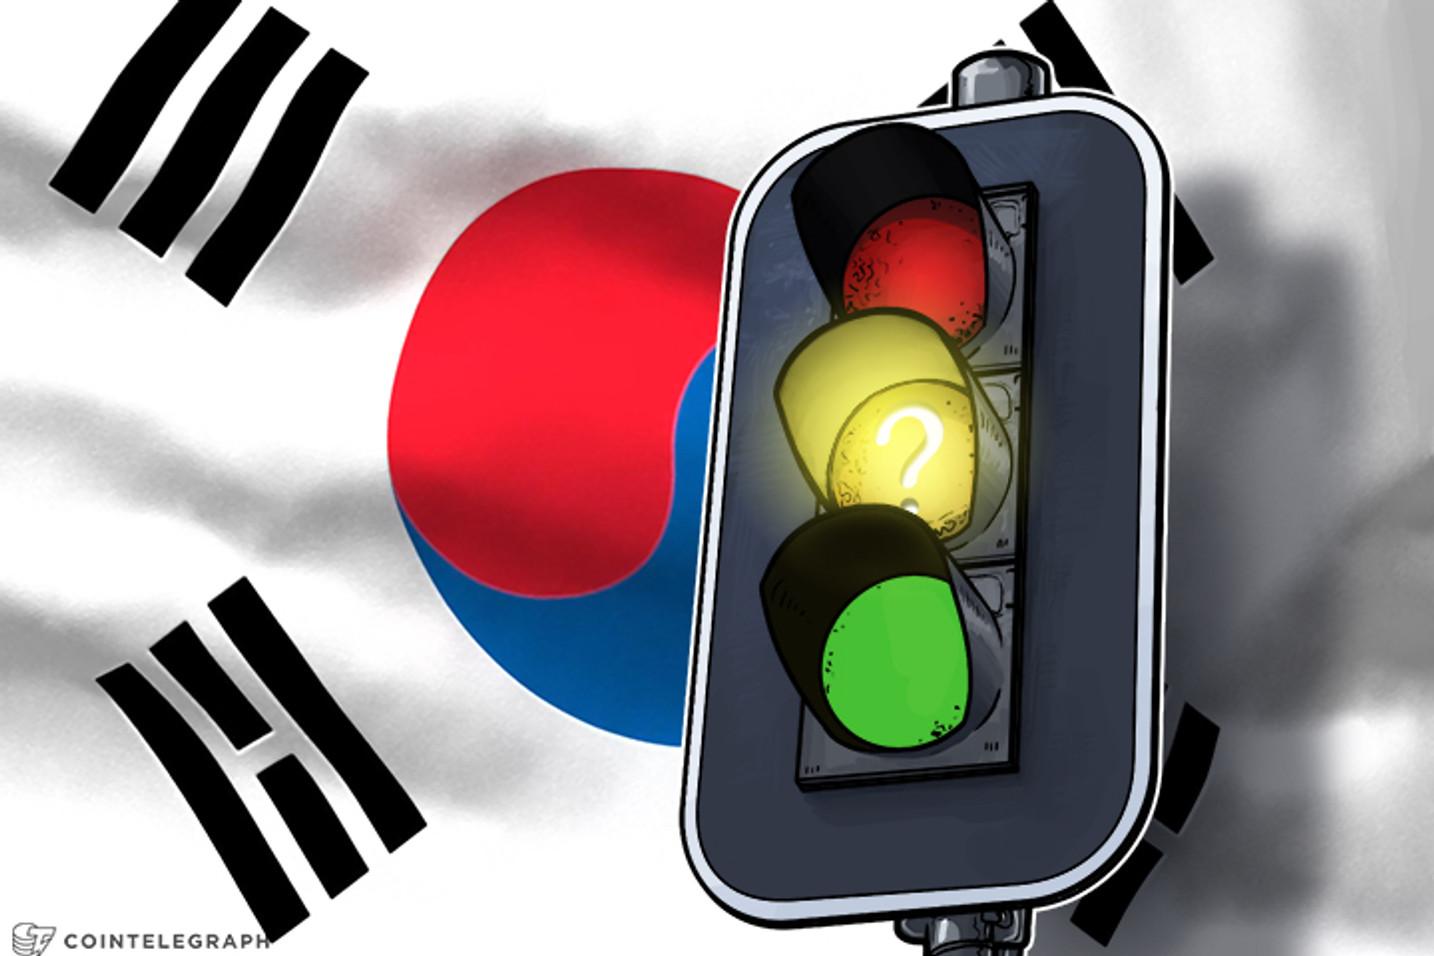 """Ništa još nije konačno"": Ministri u Vladi Južne Koreje o zabrani kriptovaluta"